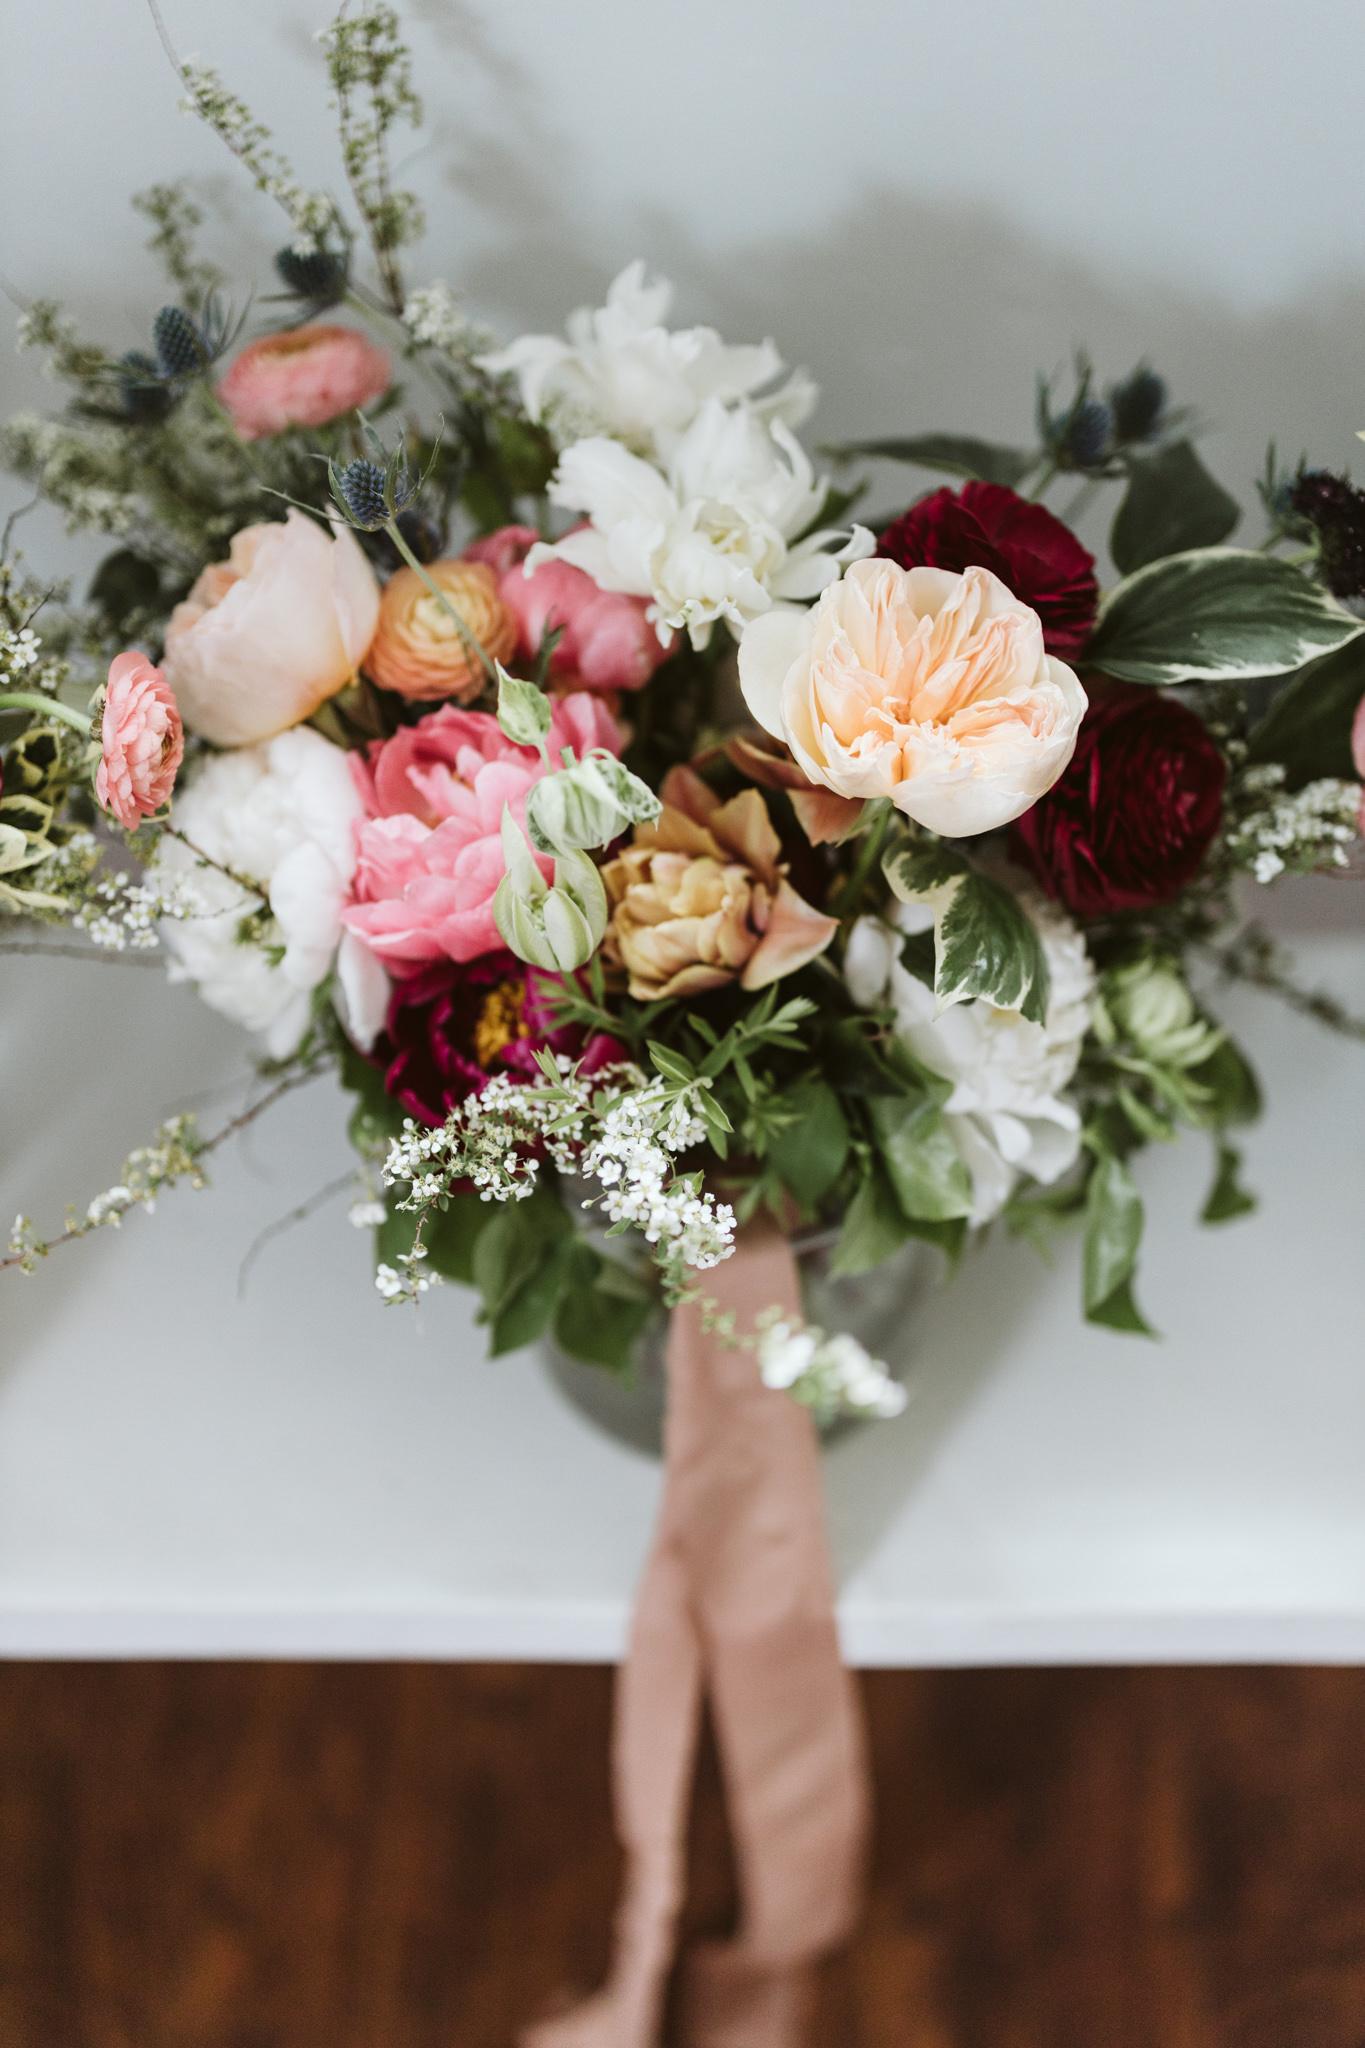 Olive_and_June_Florals-3.jpg